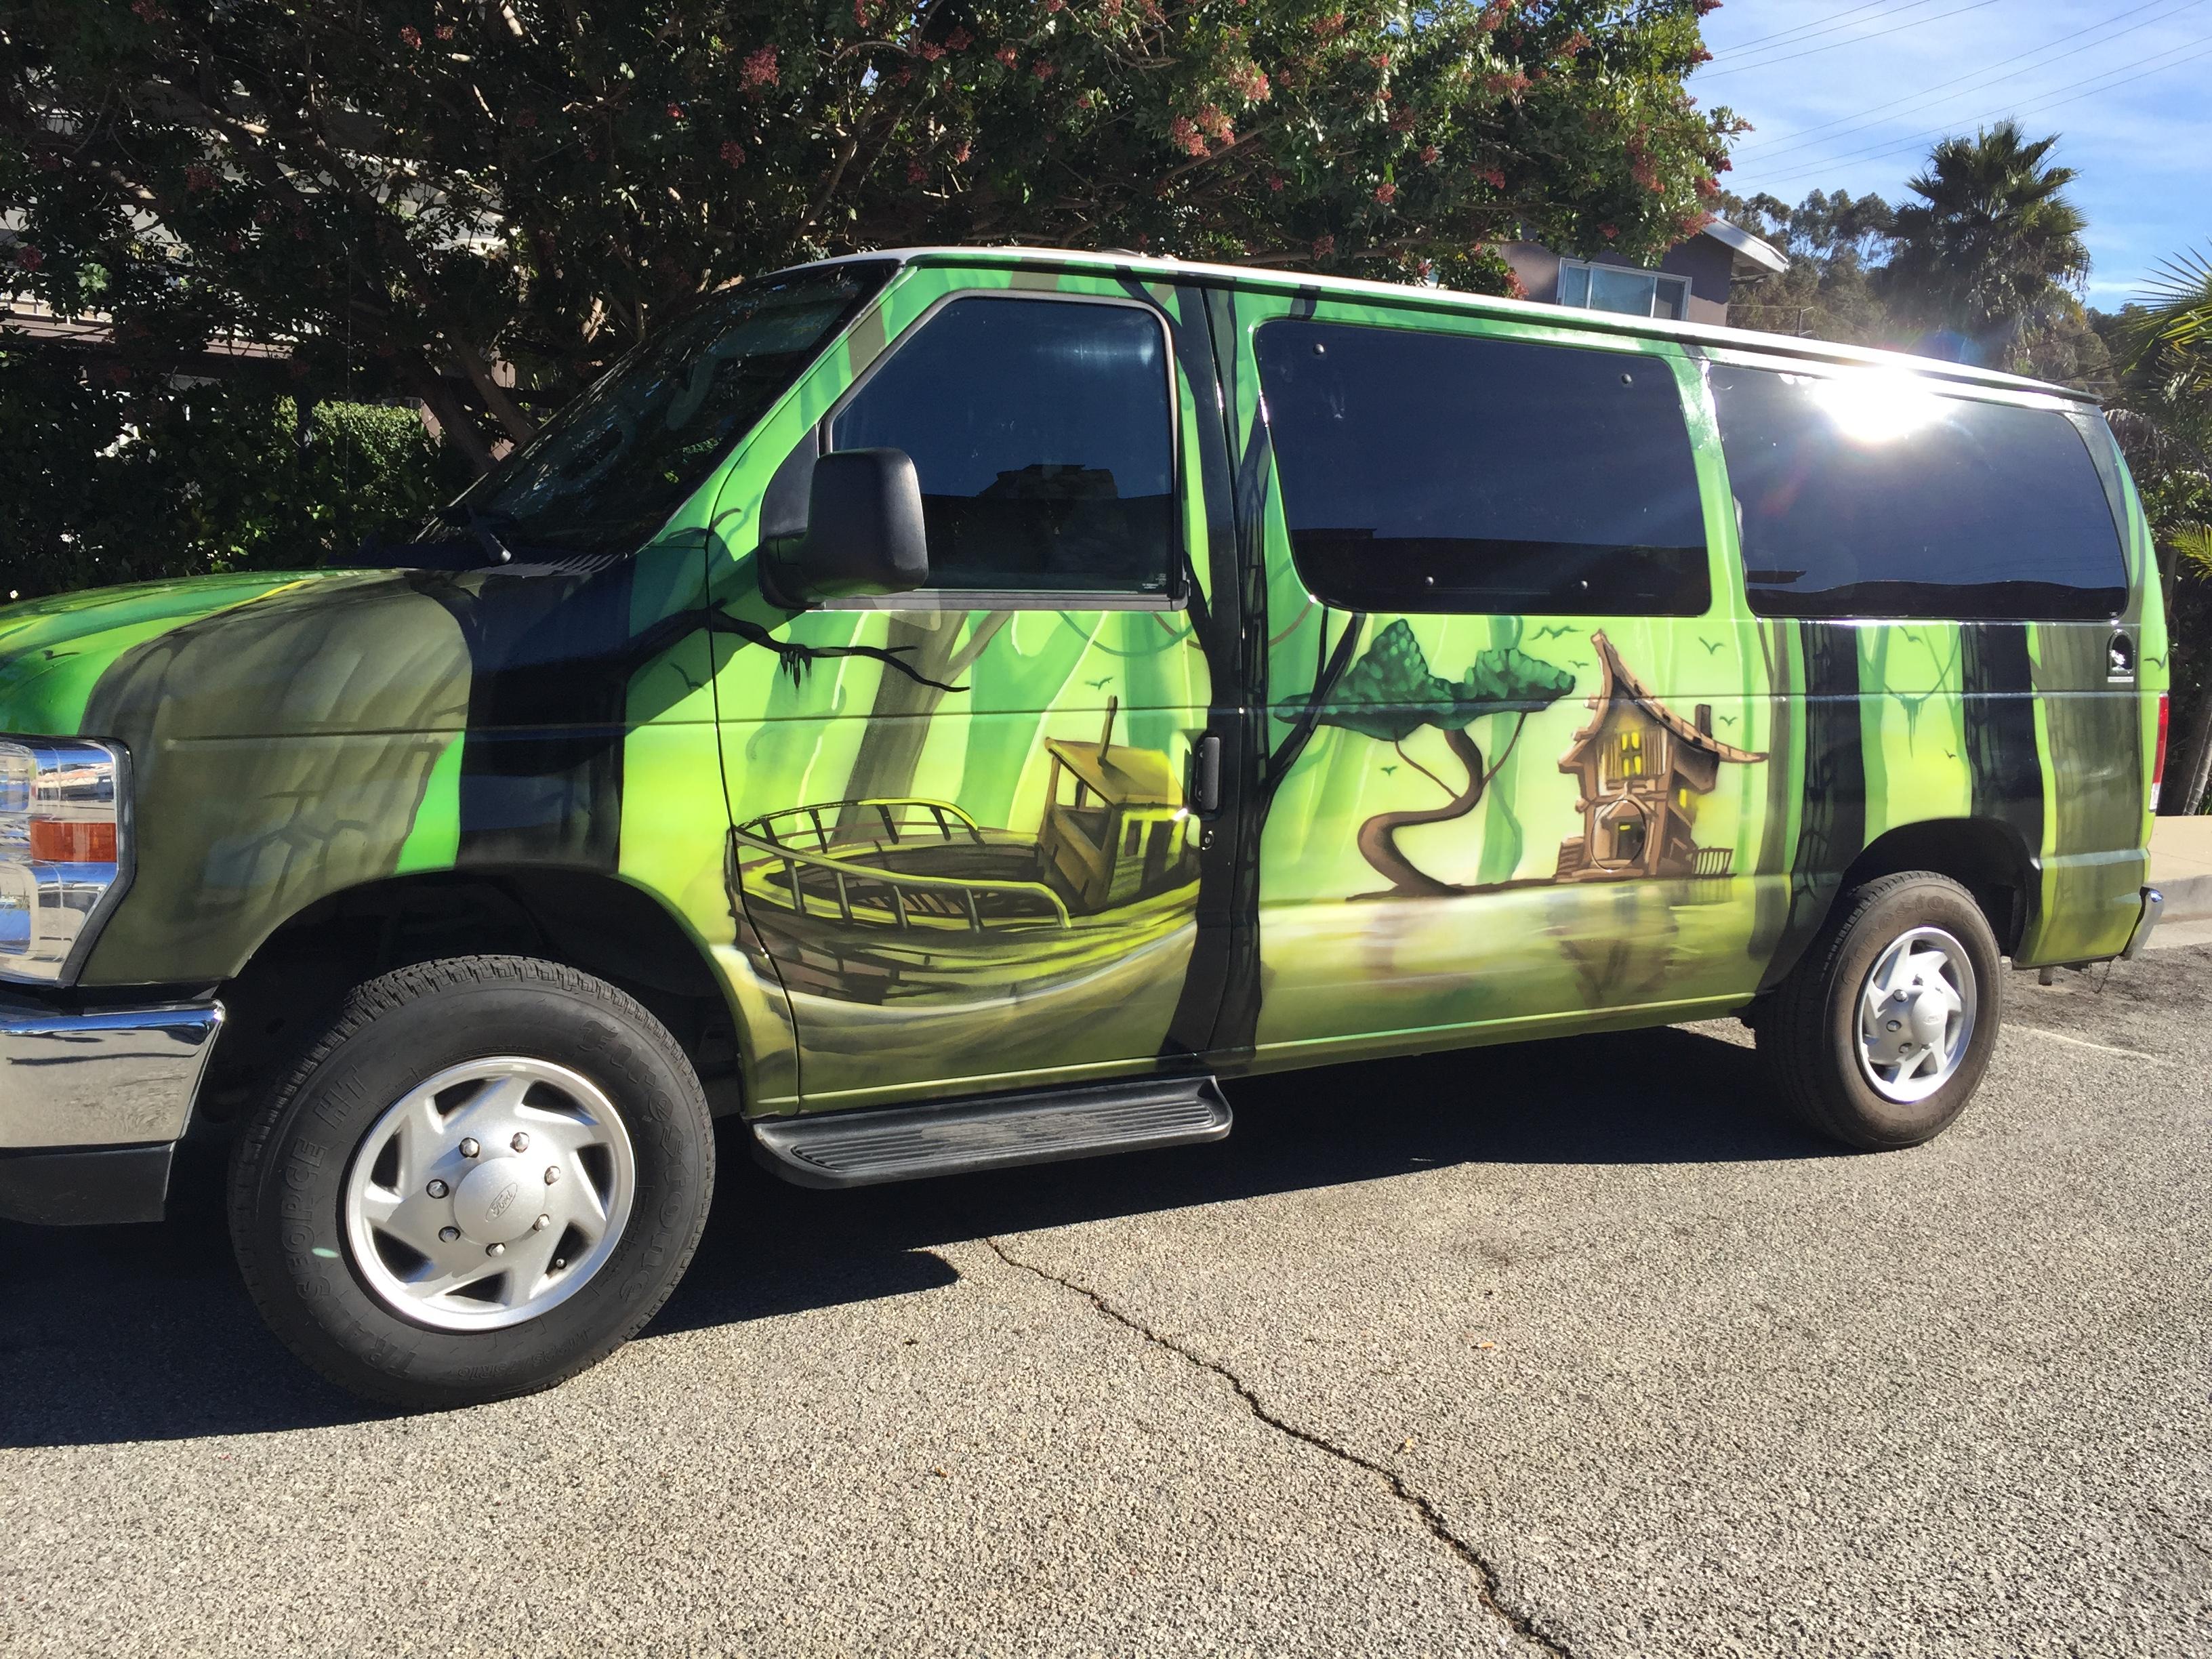 Escape Campervans - An RV Rental Alternative   Invisible in